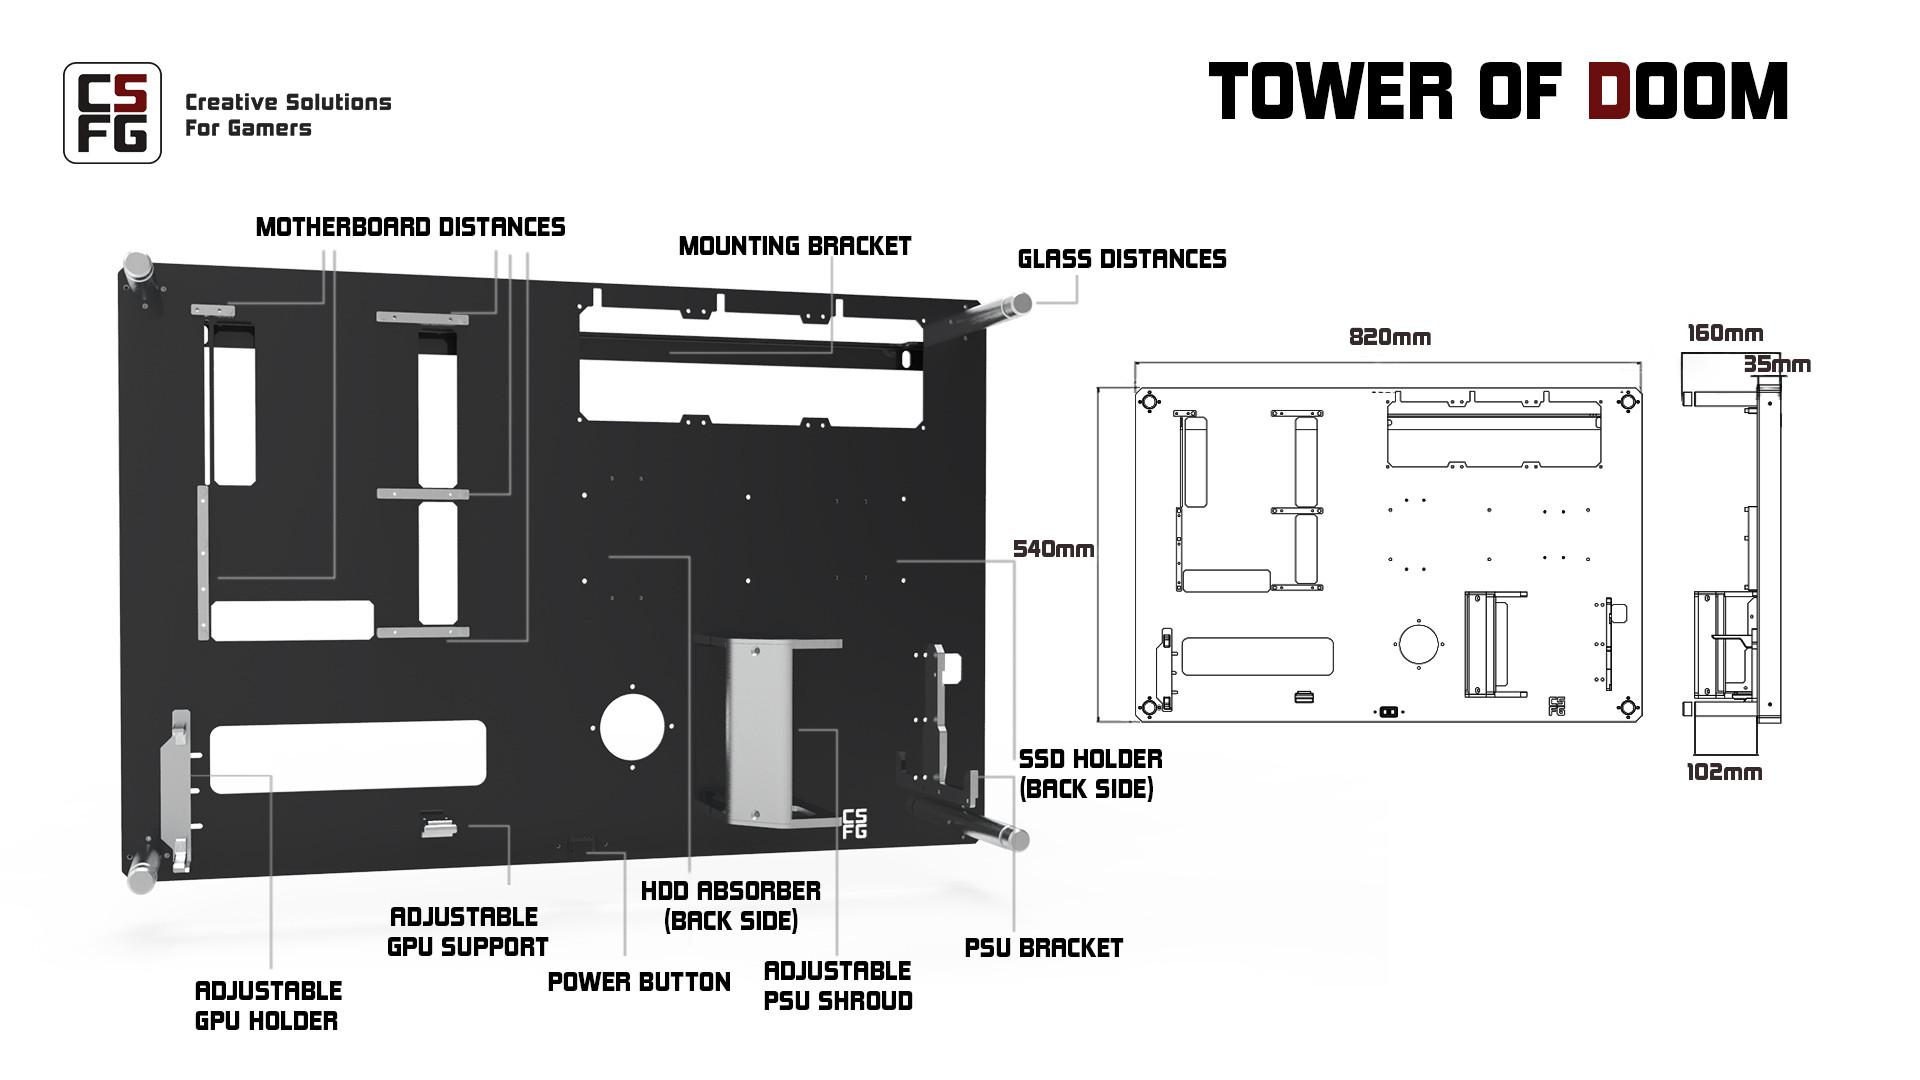 tower_of_doom_specs_2_new.jpg